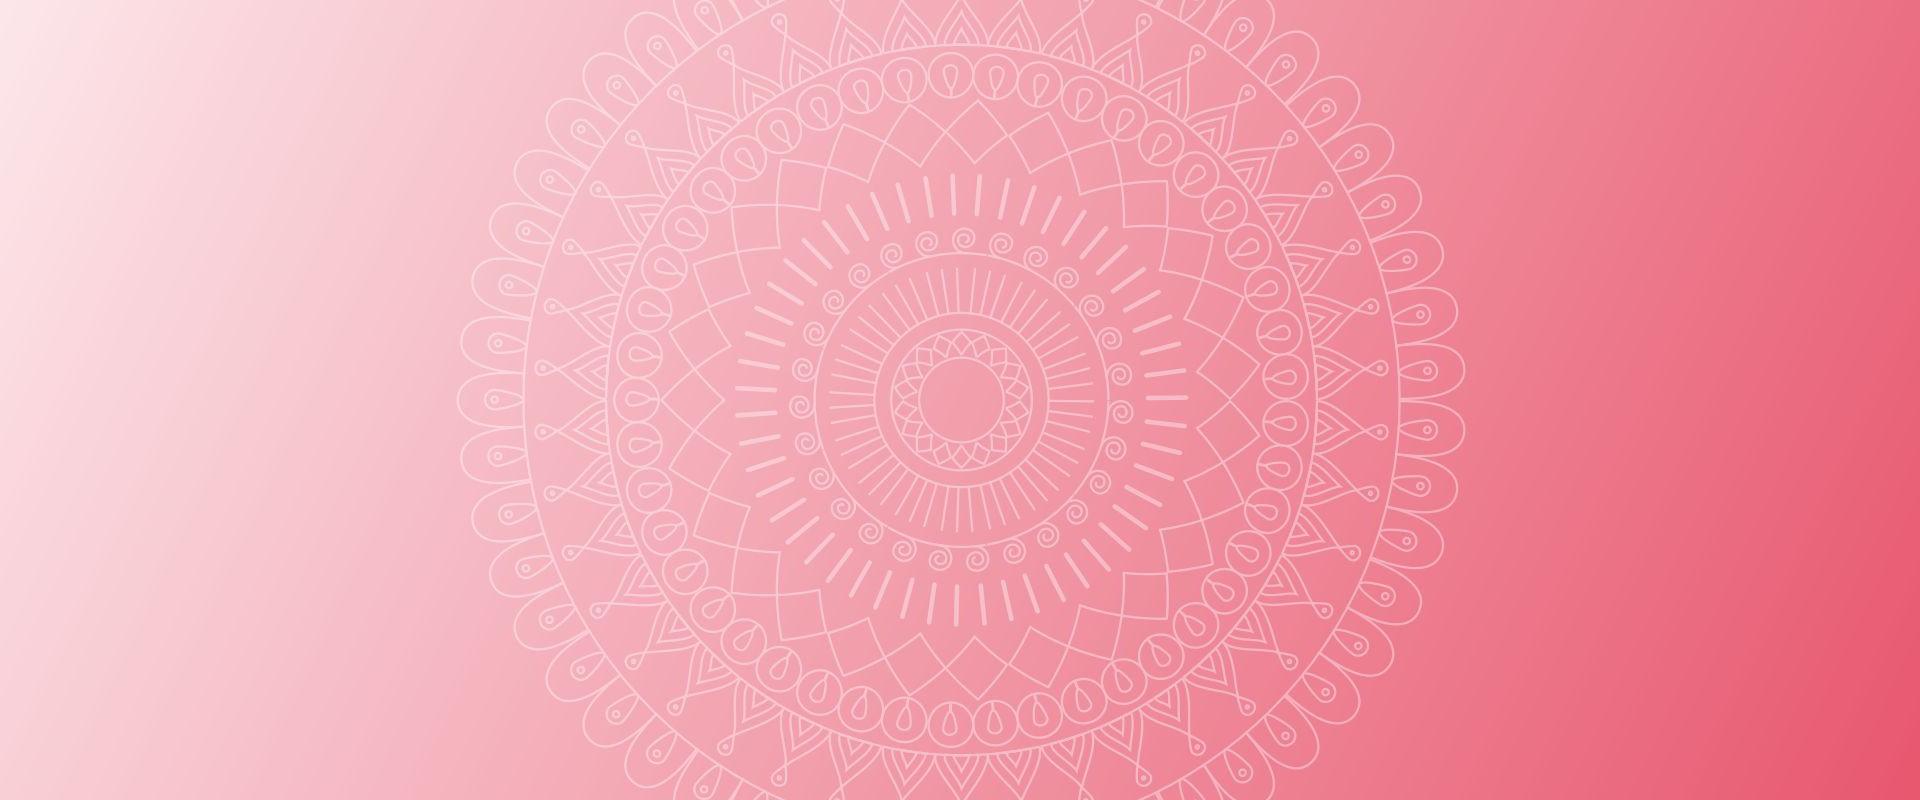 dorit-bull-guestrow-yoga-studio-leistungen-mandala-pink